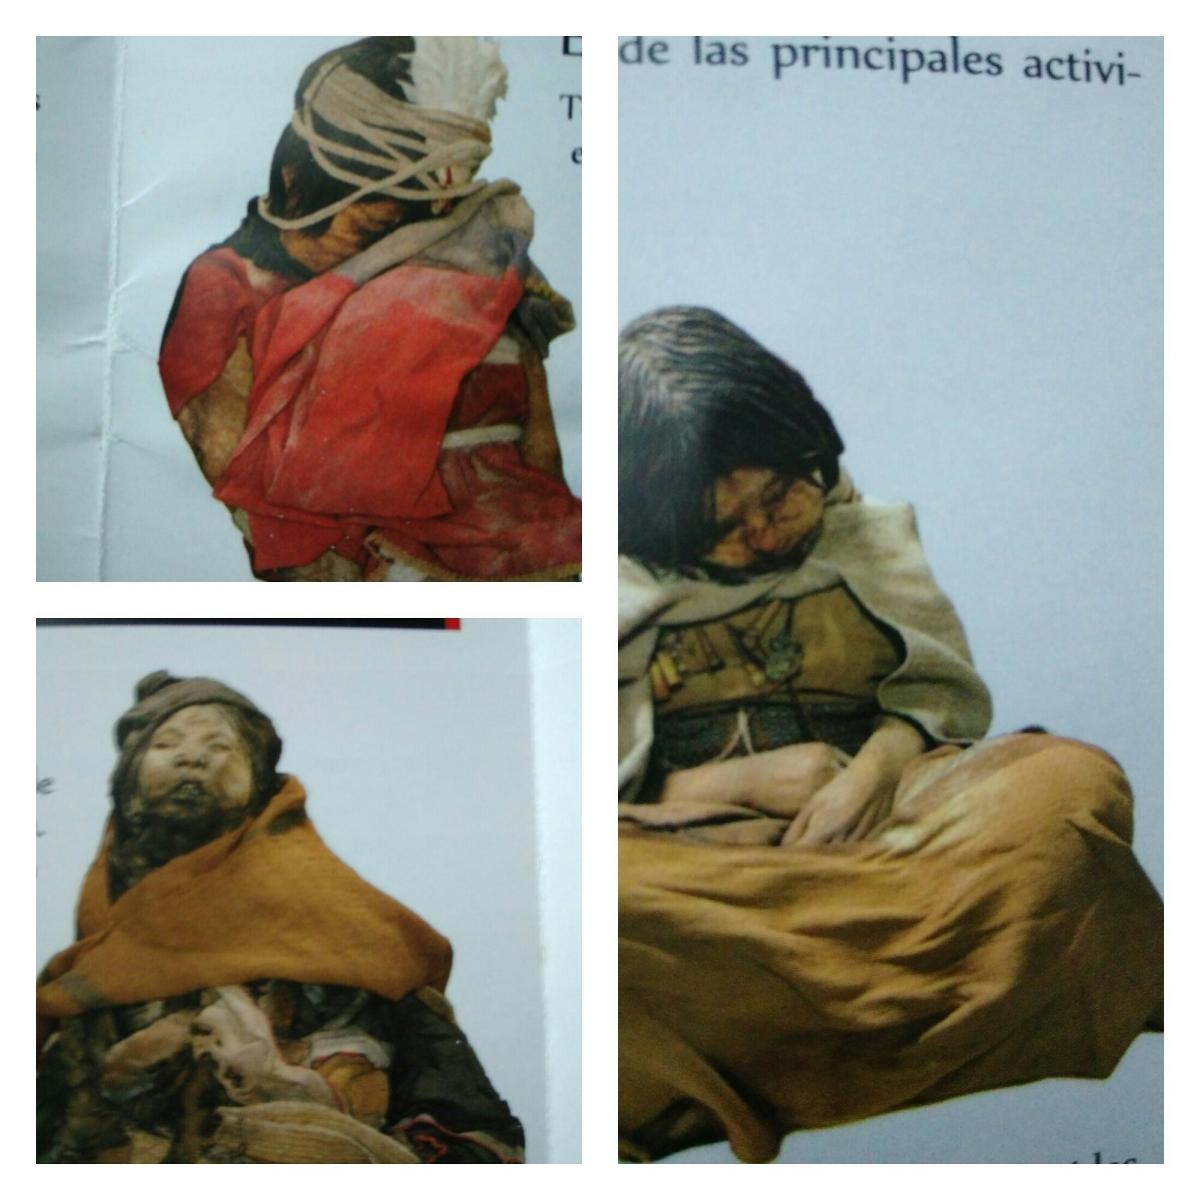 I bambini Inca sacrificati alla montagna: 3 mummie conservate a Salta